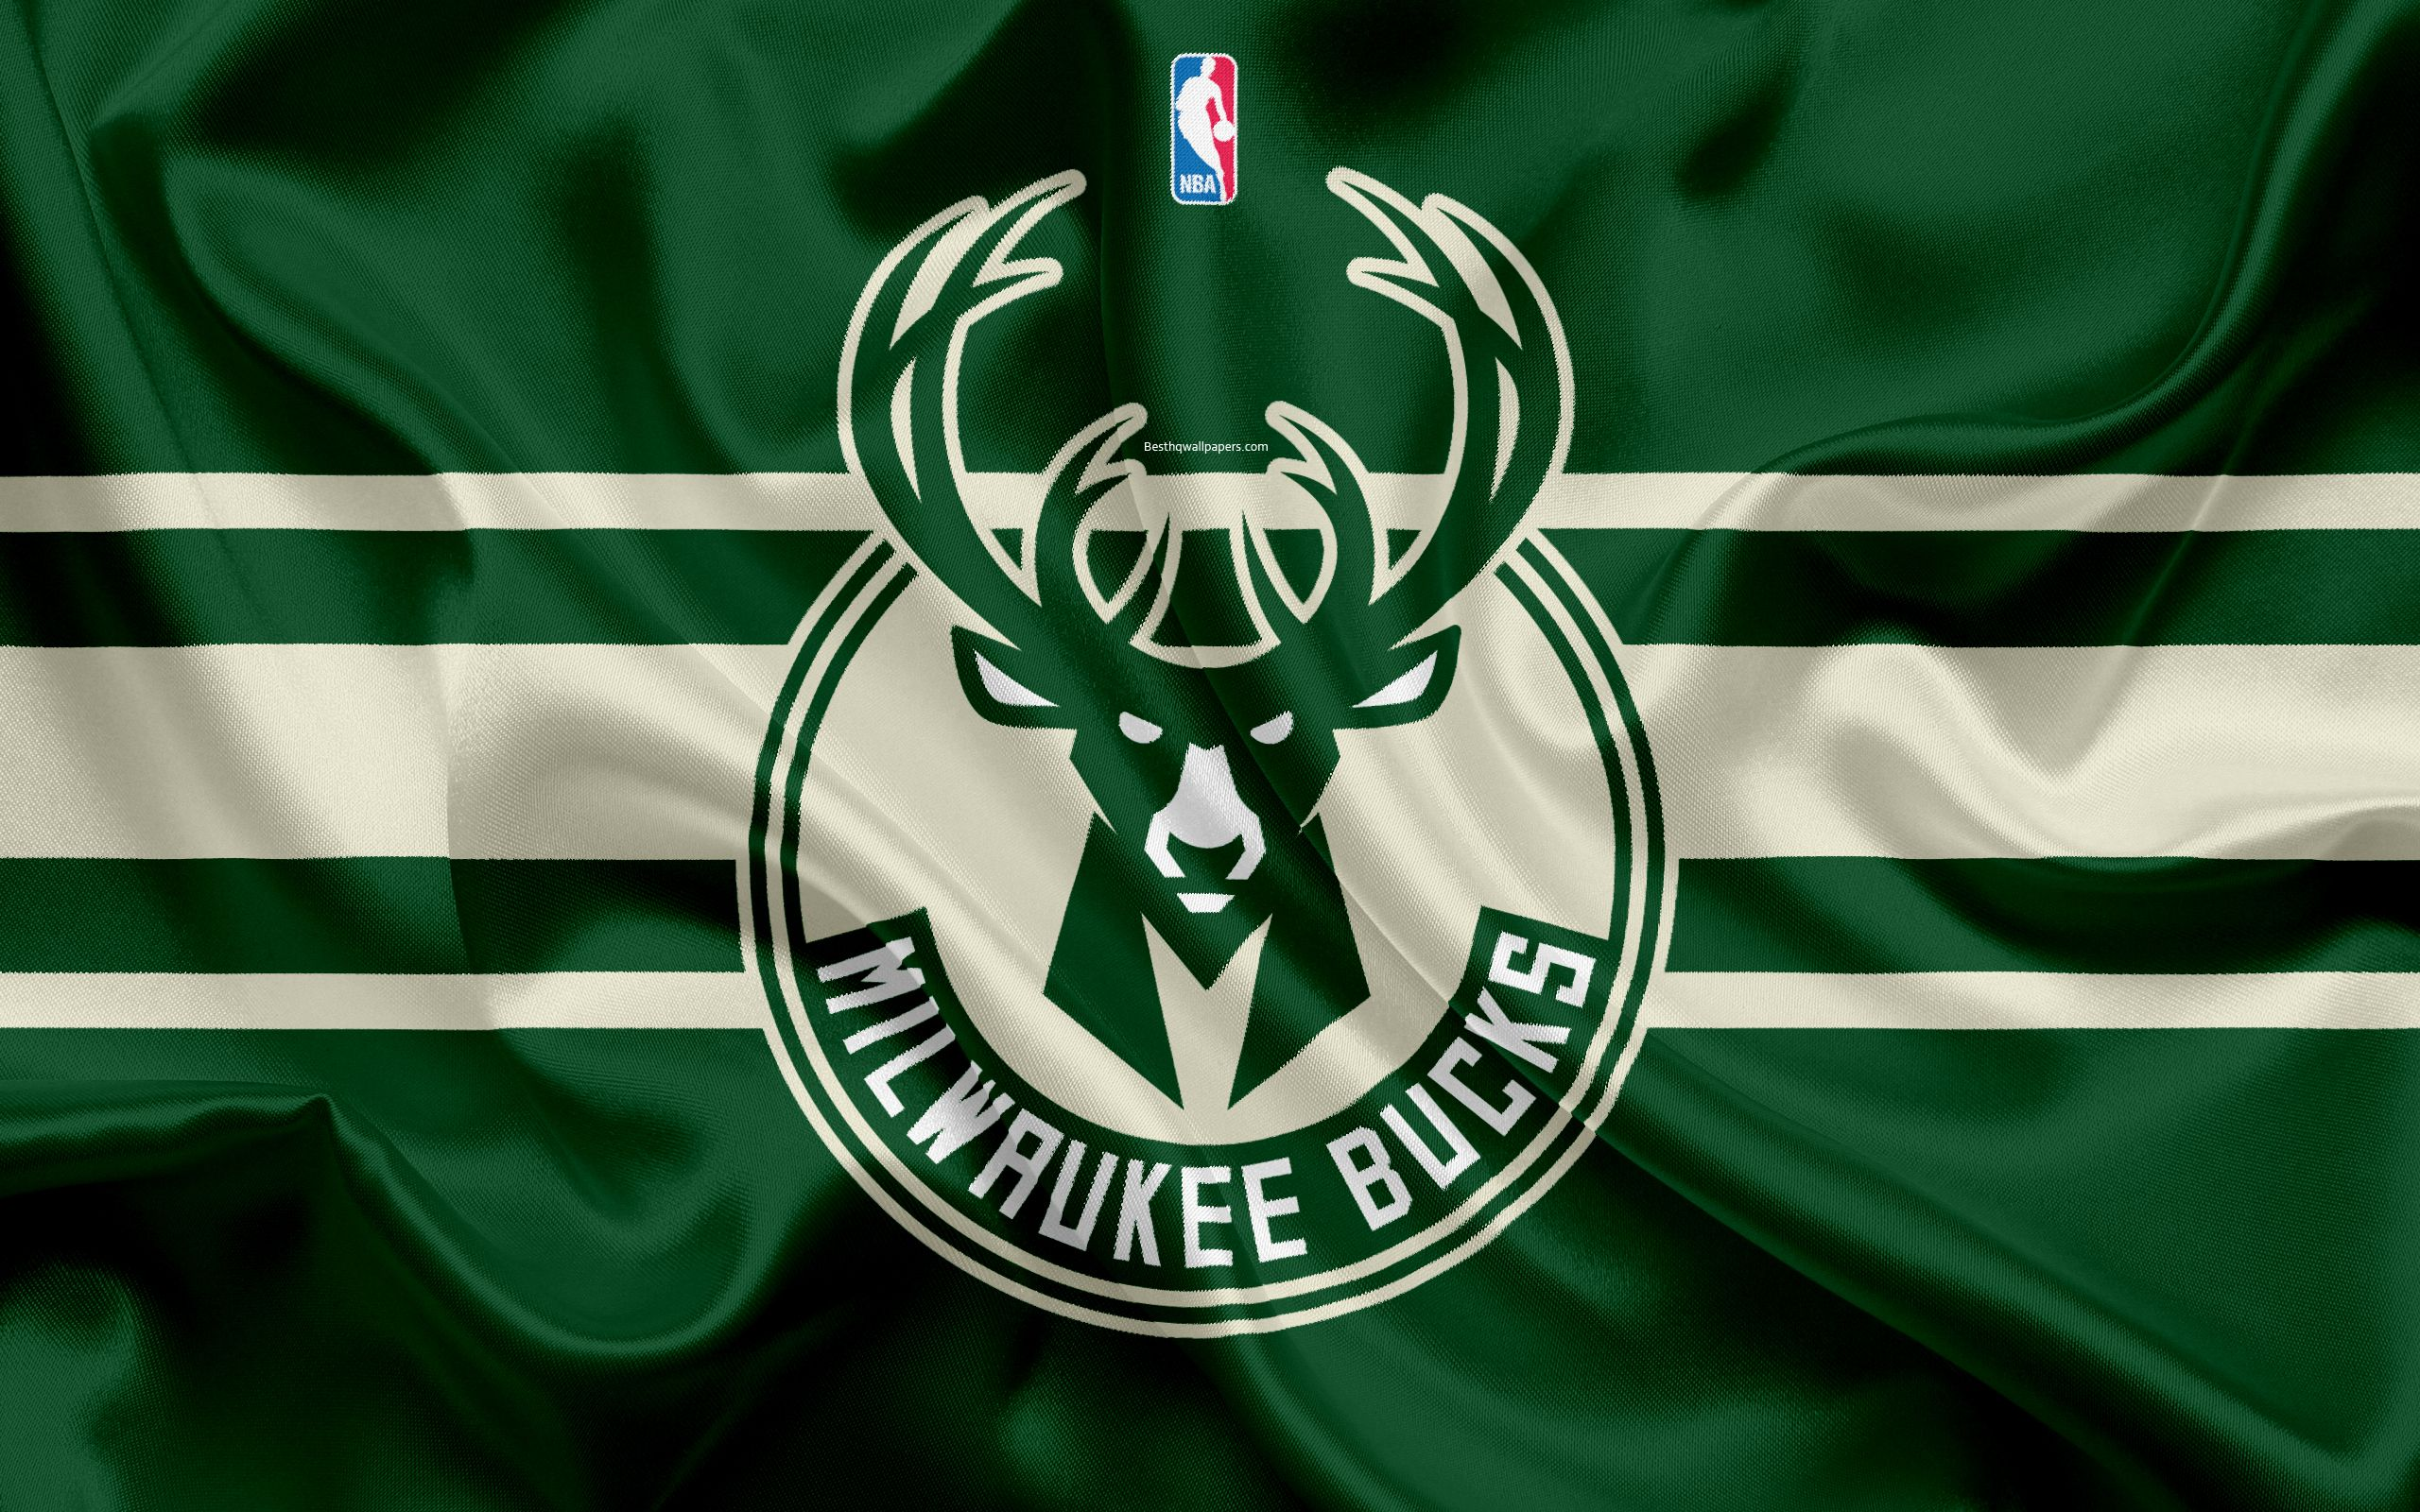 Milwaukee Bucks Wallpapers Top Free Milwaukee Bucks